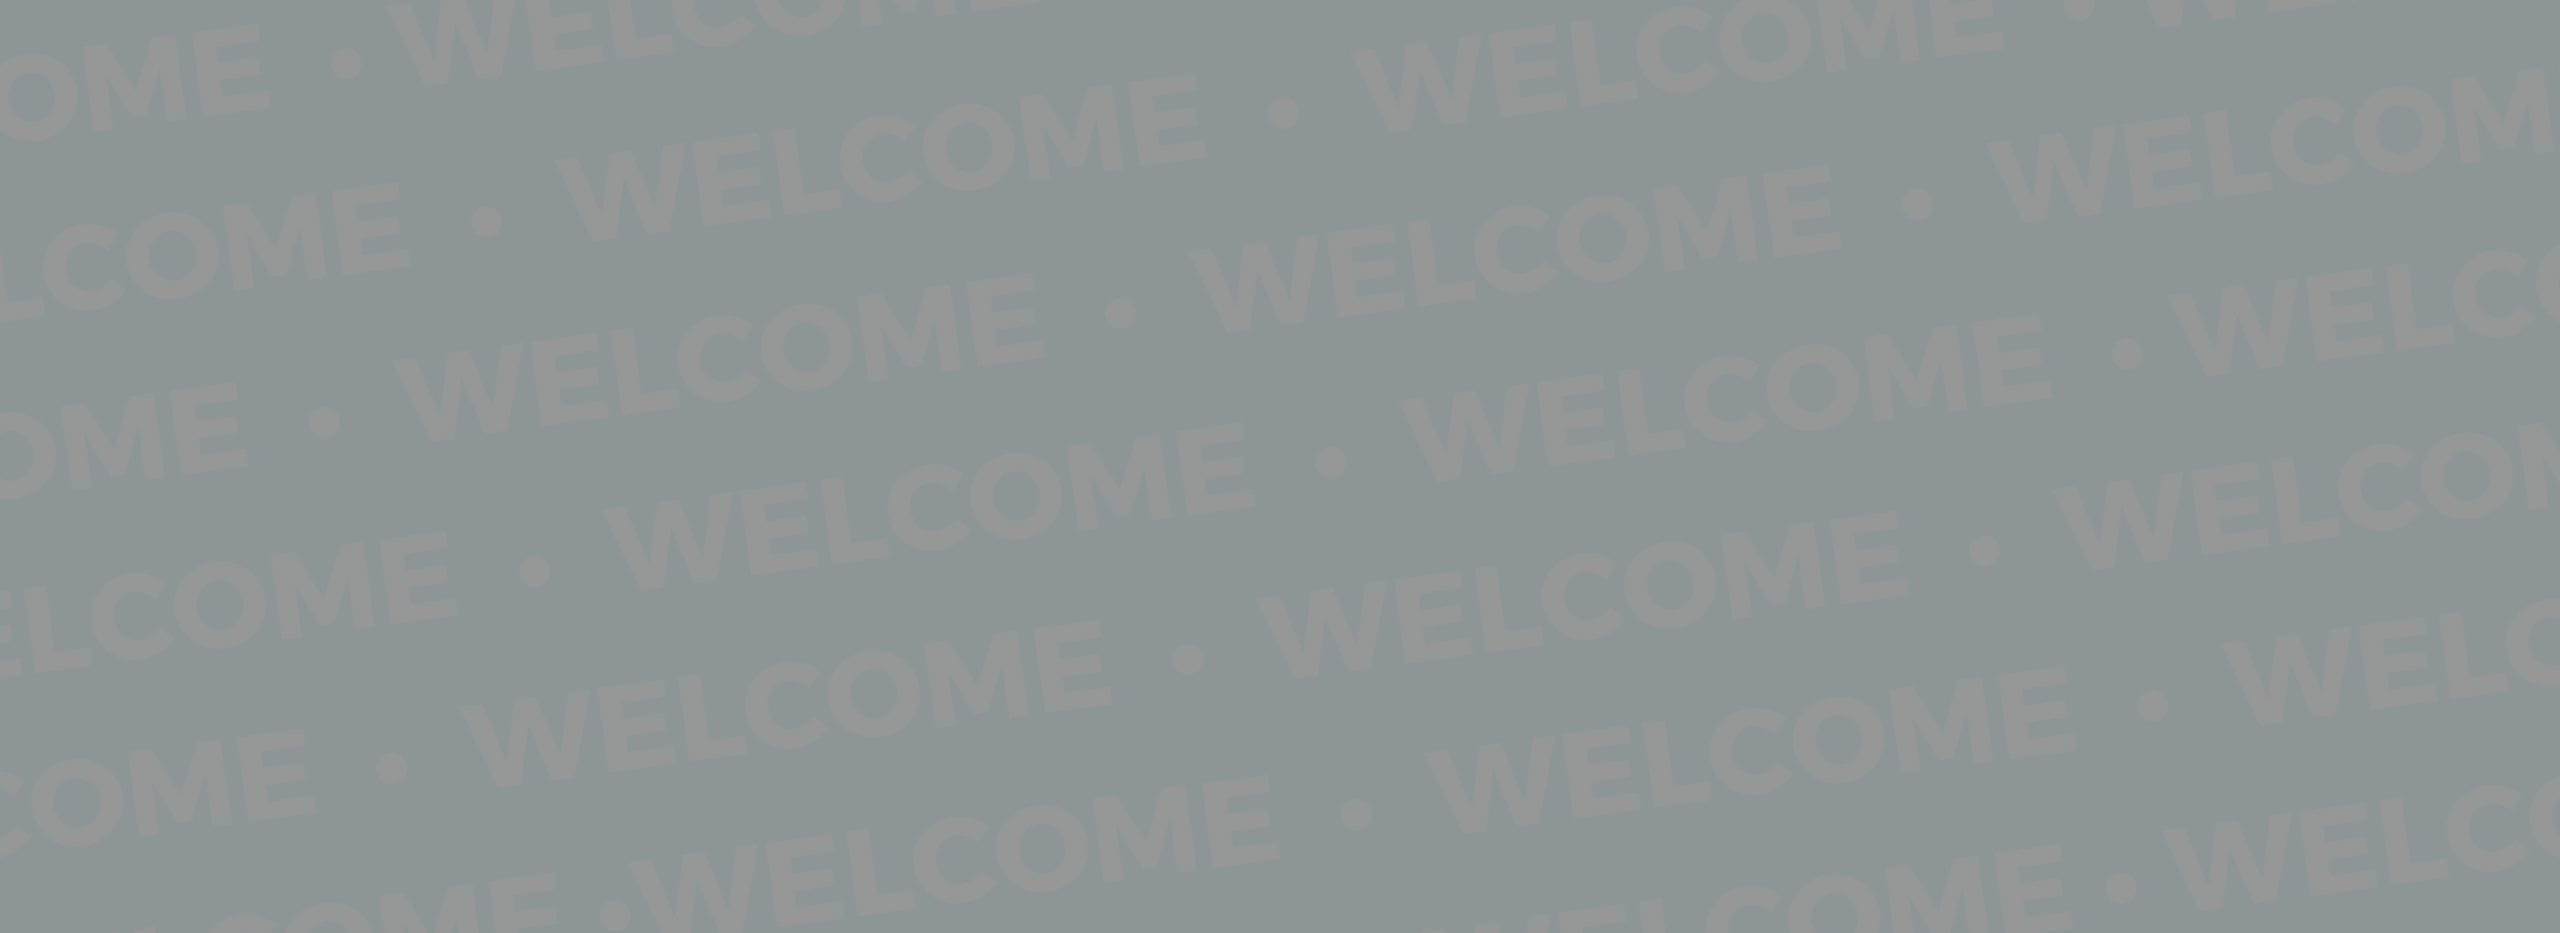 MRE | AP Welcomes New Agent Pamela Smith